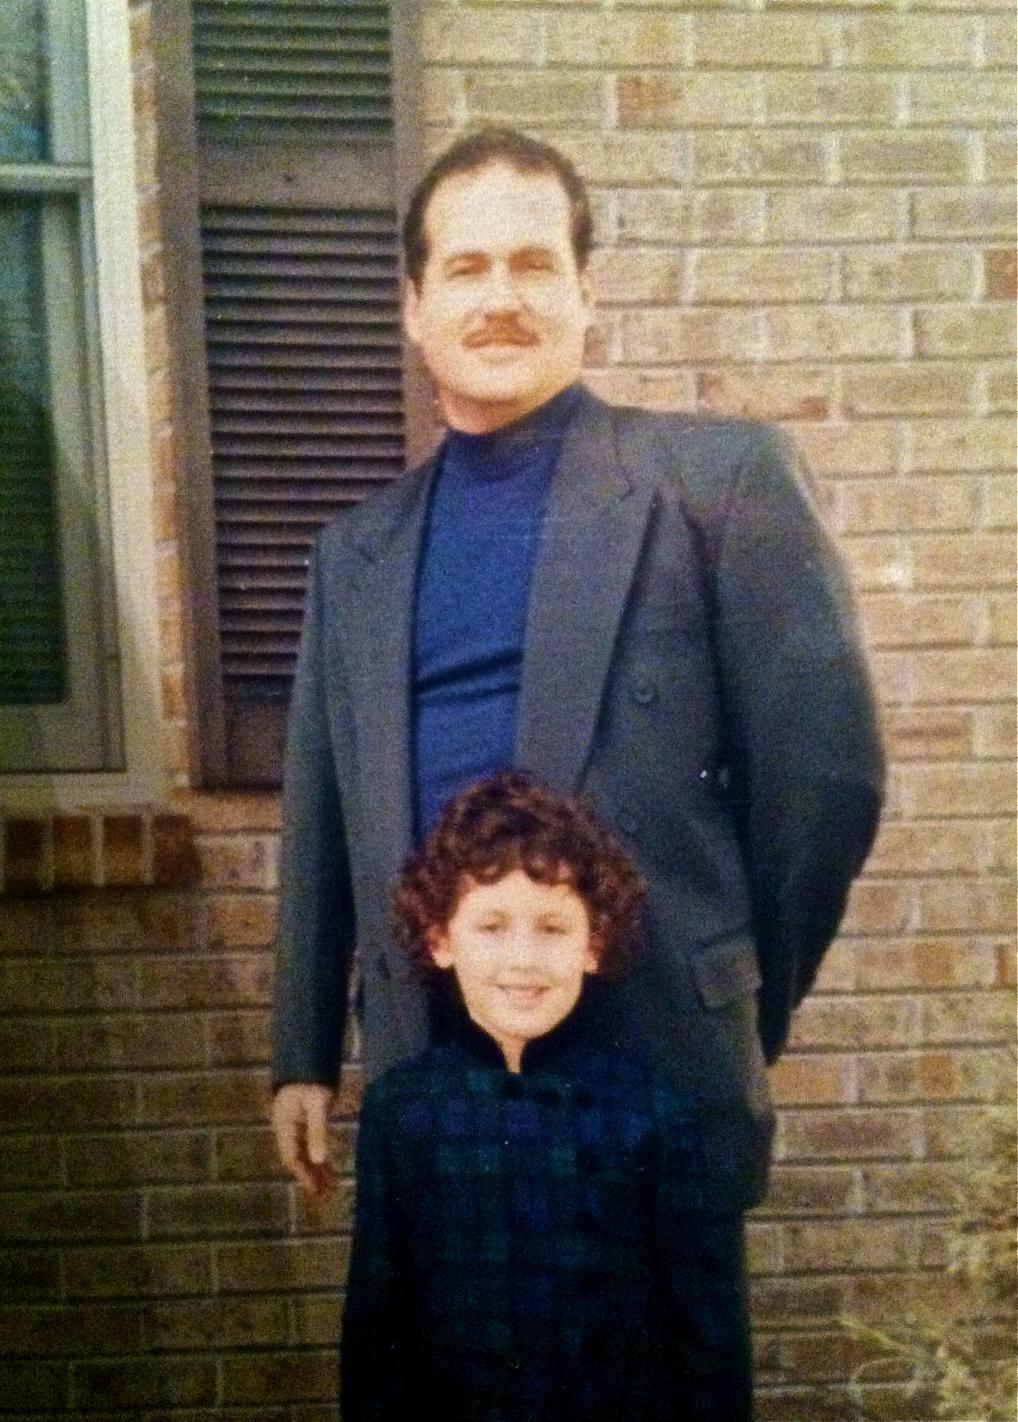 I've gotten a bit taller over the years